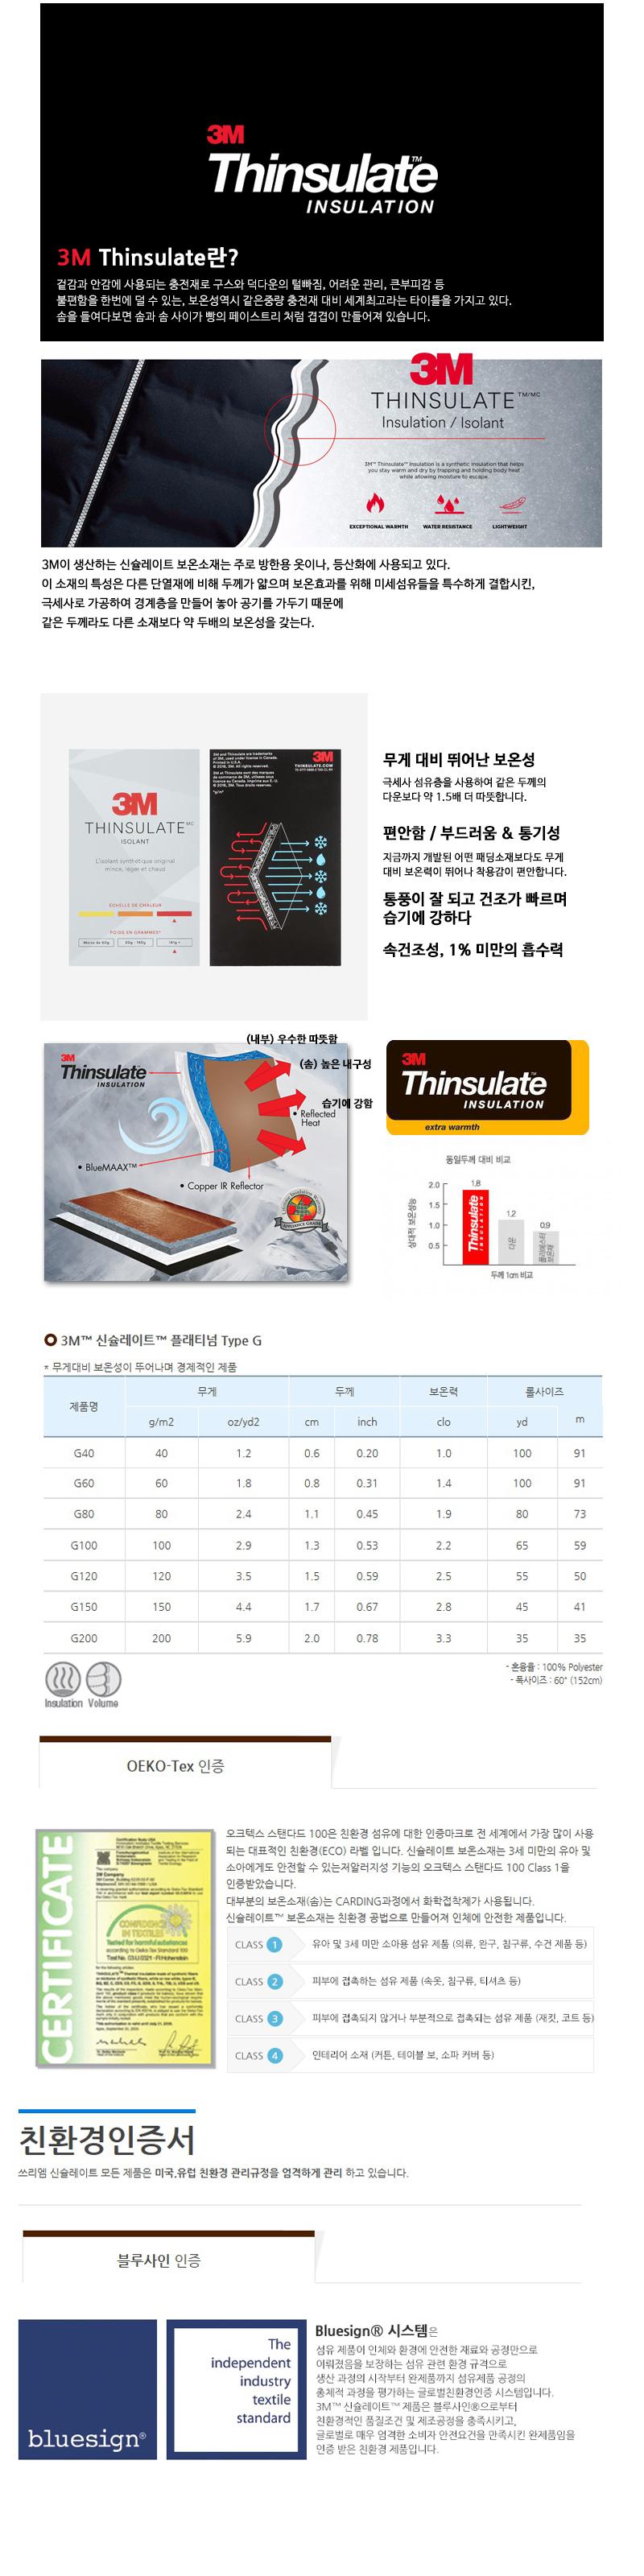 3M_thinsulate_top.jpg